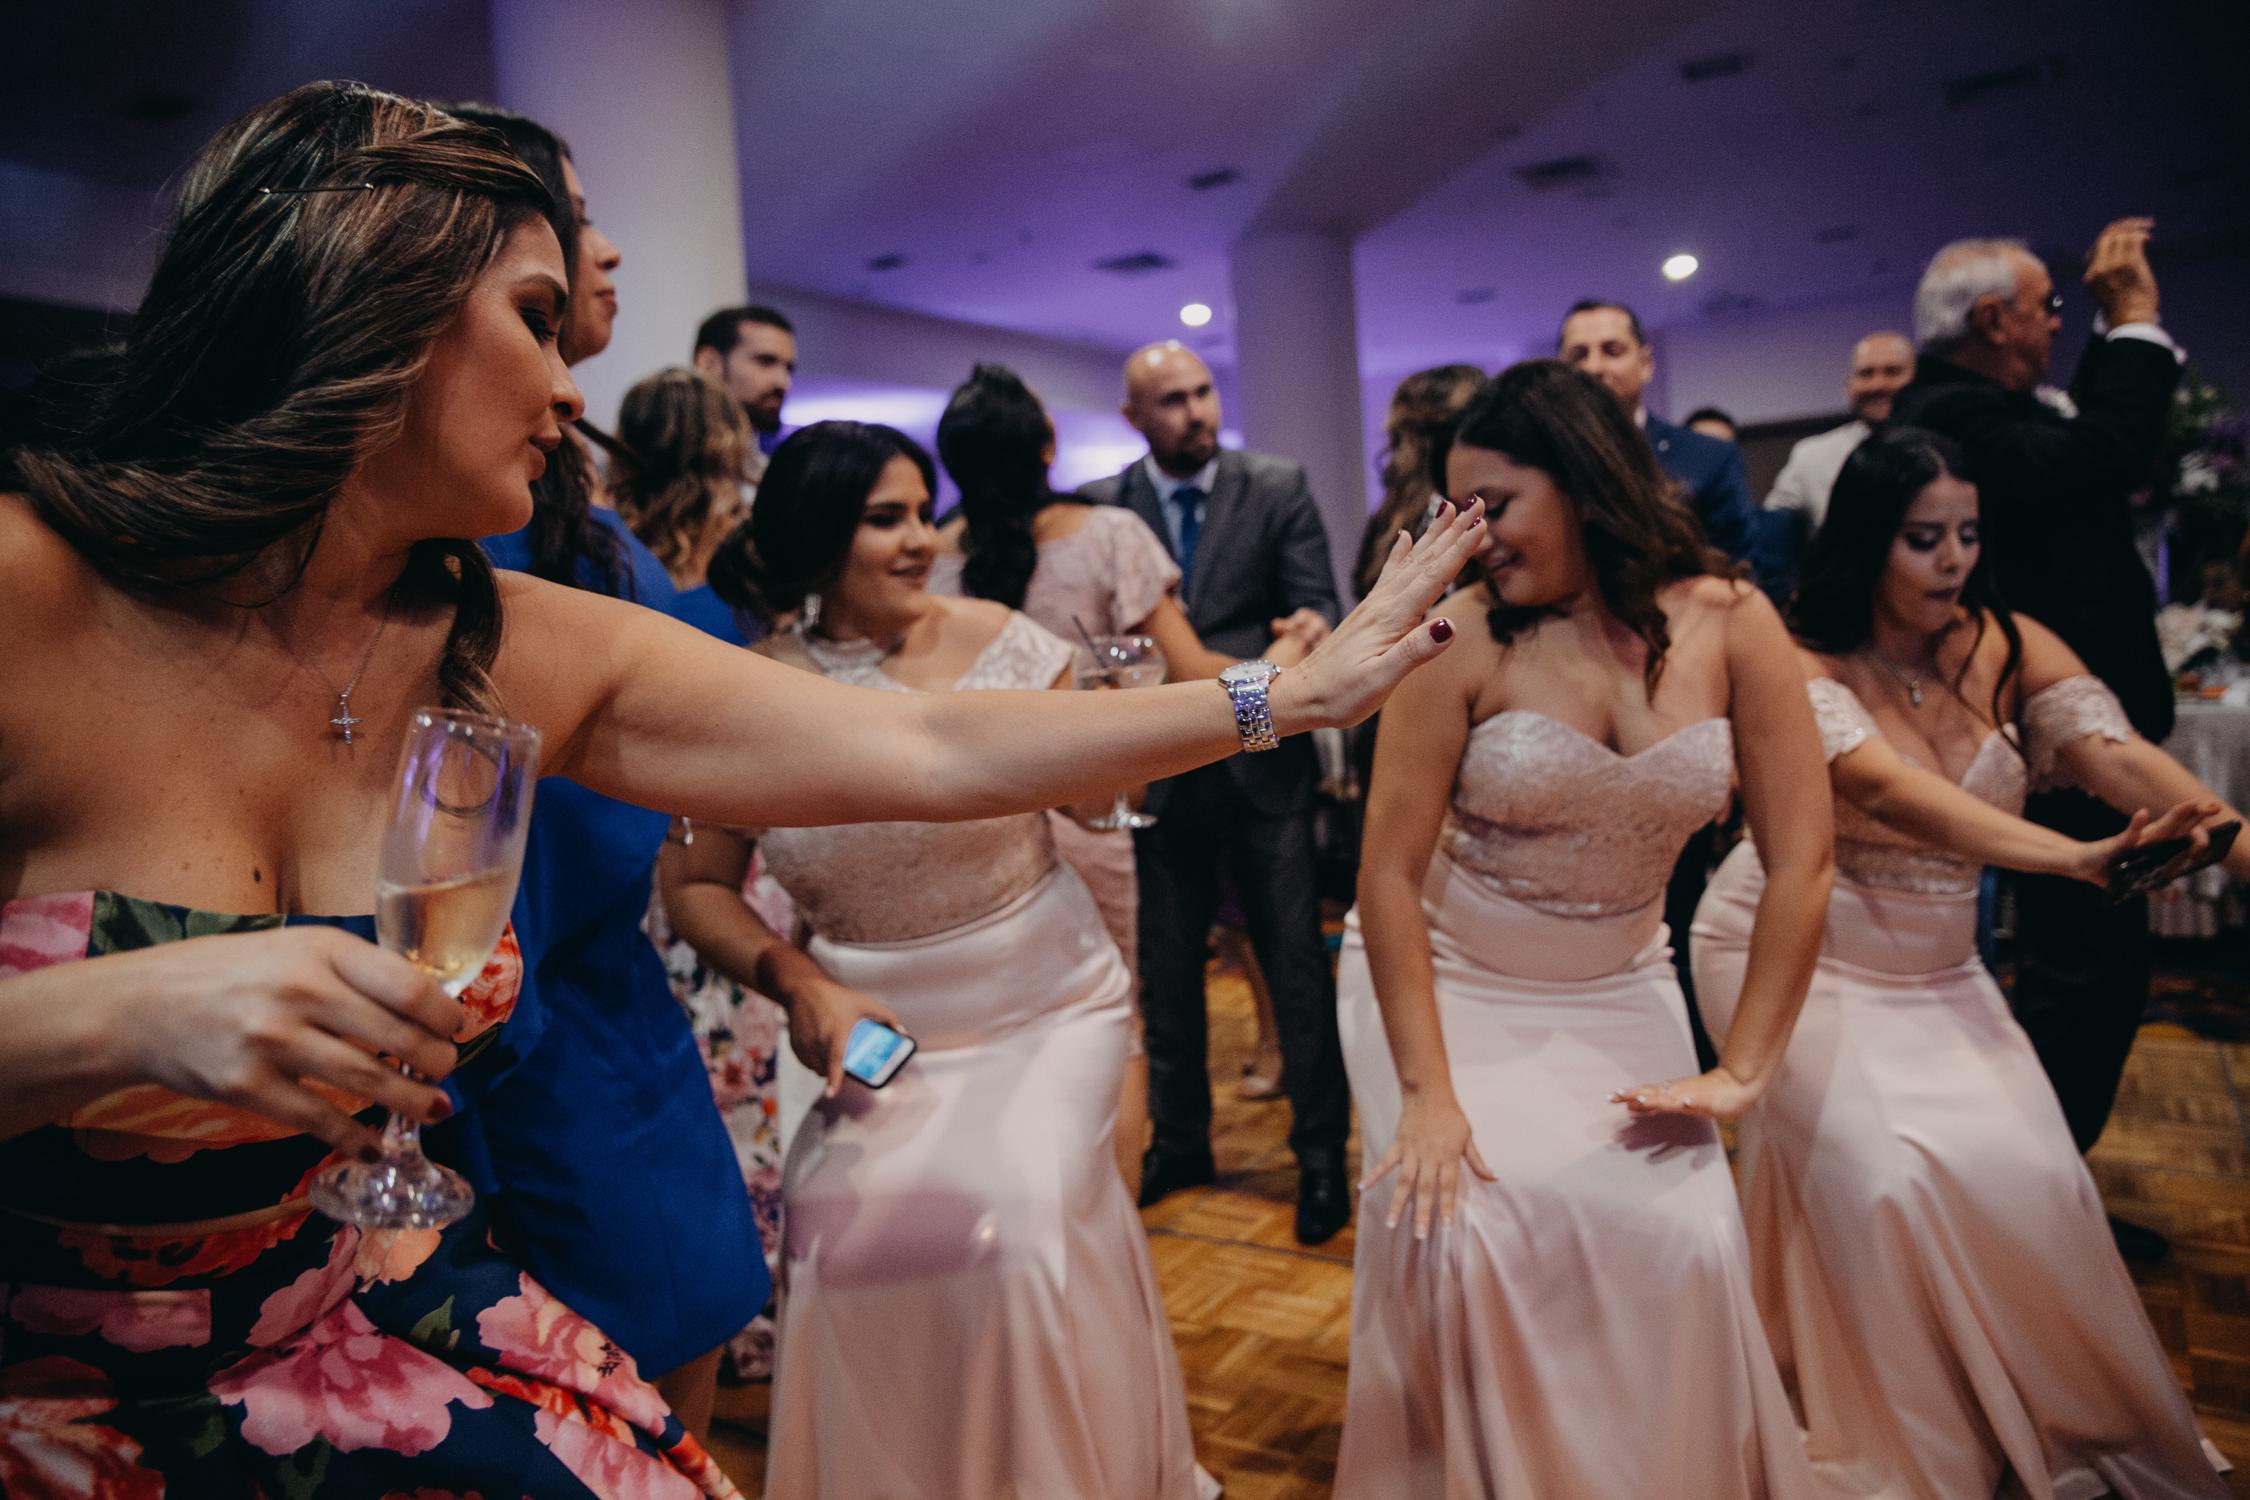 Michelle-Agurto-Fotografia-Bodas-Ecuador-Destination-Wedding-Photographer-Daniela-Dirk-69.JPG